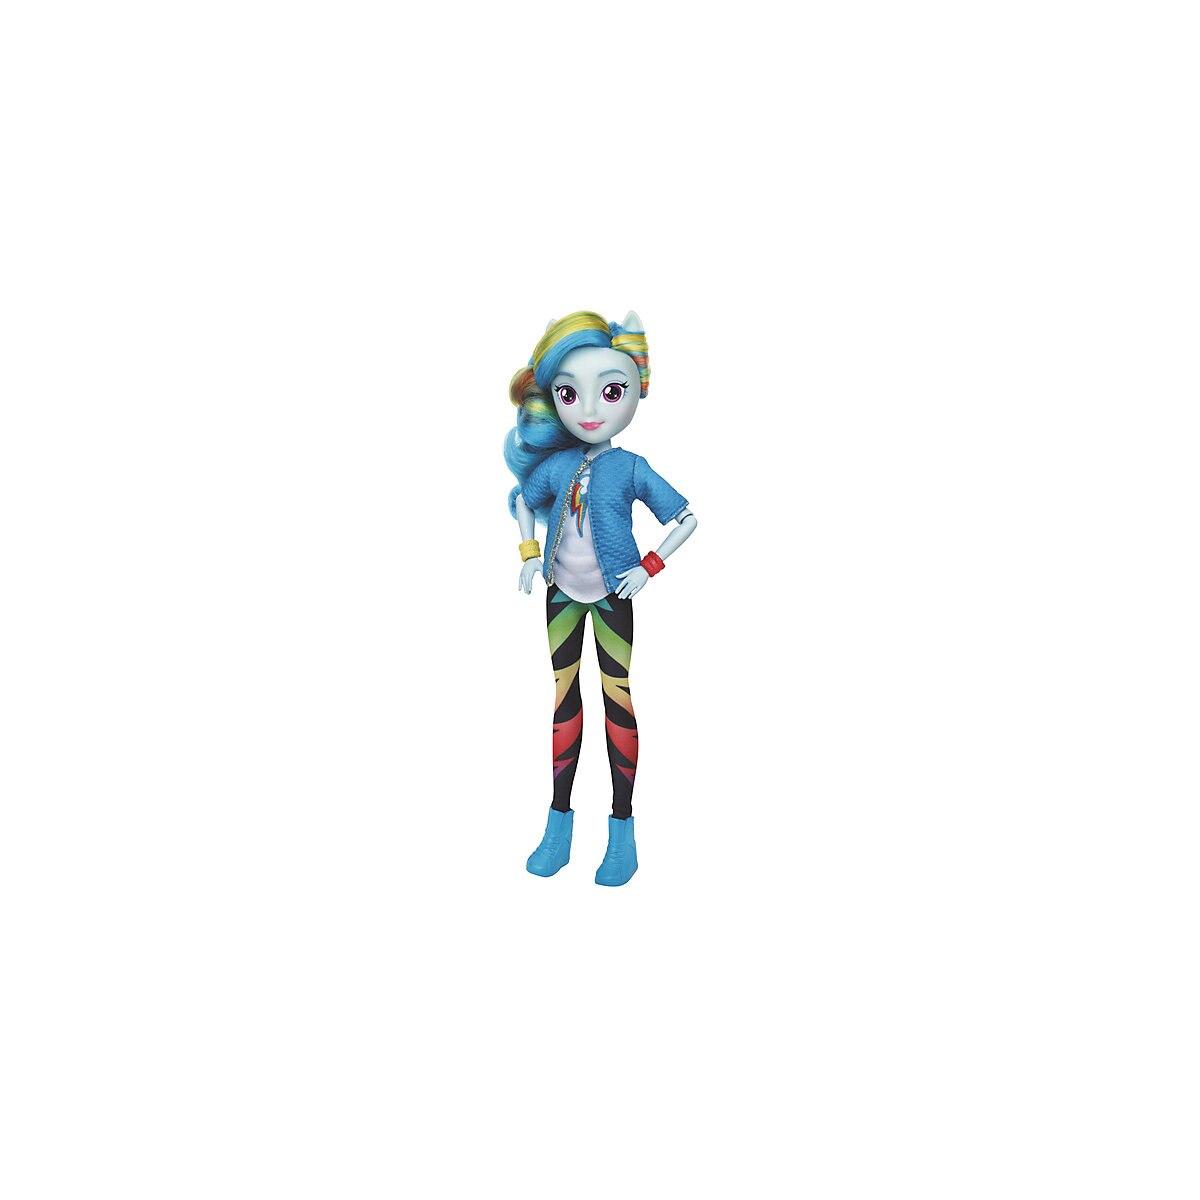 HASBRO muñecas 9170540 niñas juguetes para niños niñas juguete moda muñeca juego accesorios niños novia MTpromo